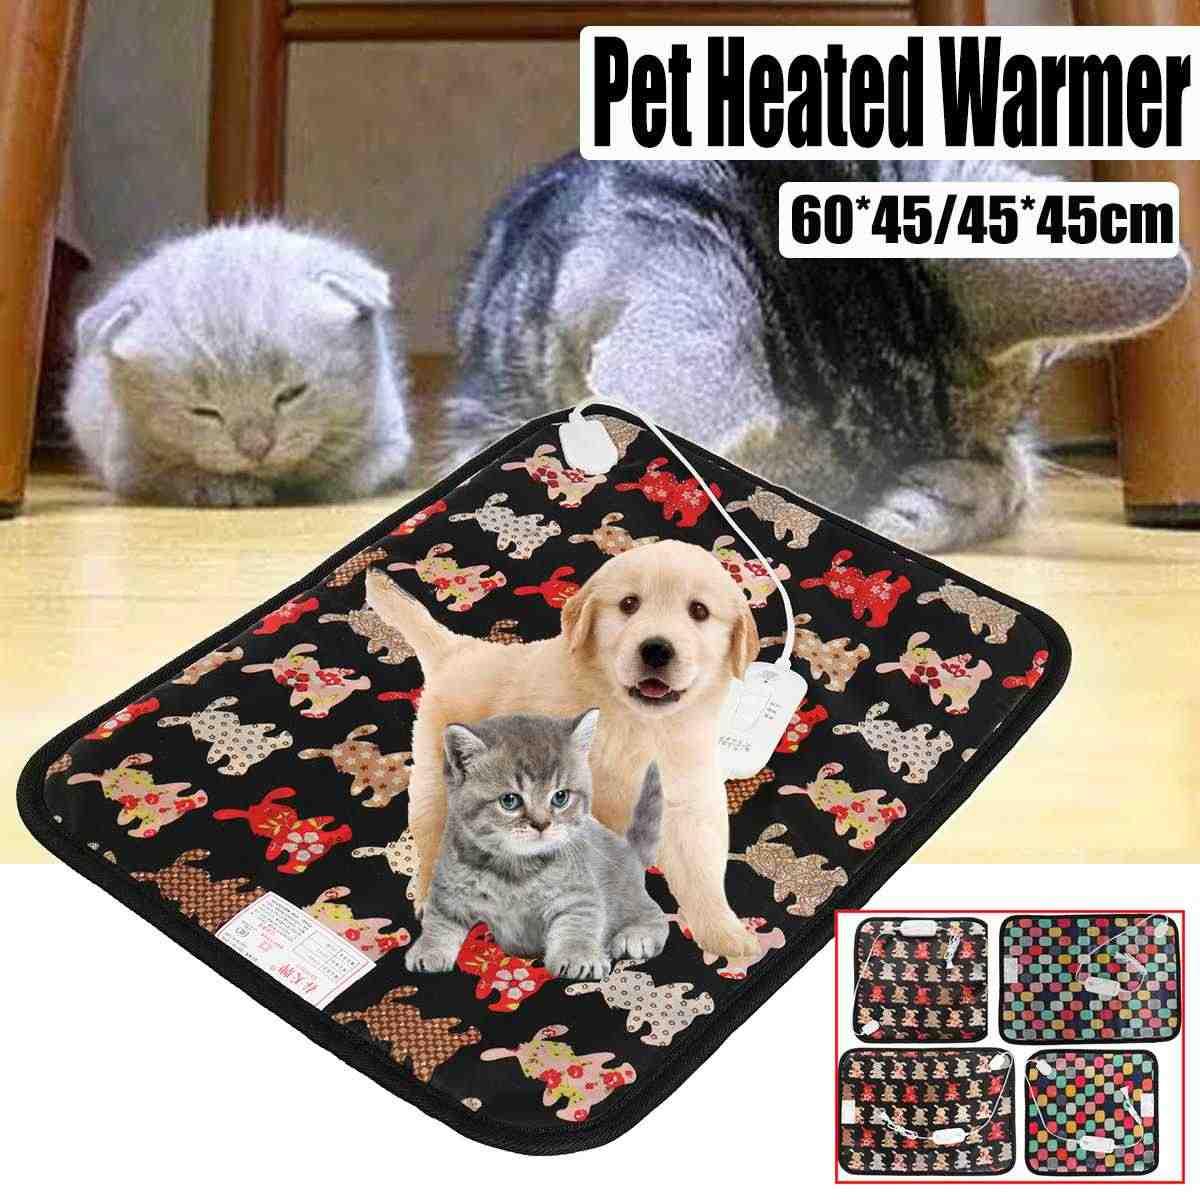 Waterproof Pet Heater Pad 45X45/60cm Pet Electric Heater Mat Anti-scratch Bite Cat Dog Pet Heated Blanket Cushion 220V 20/25W